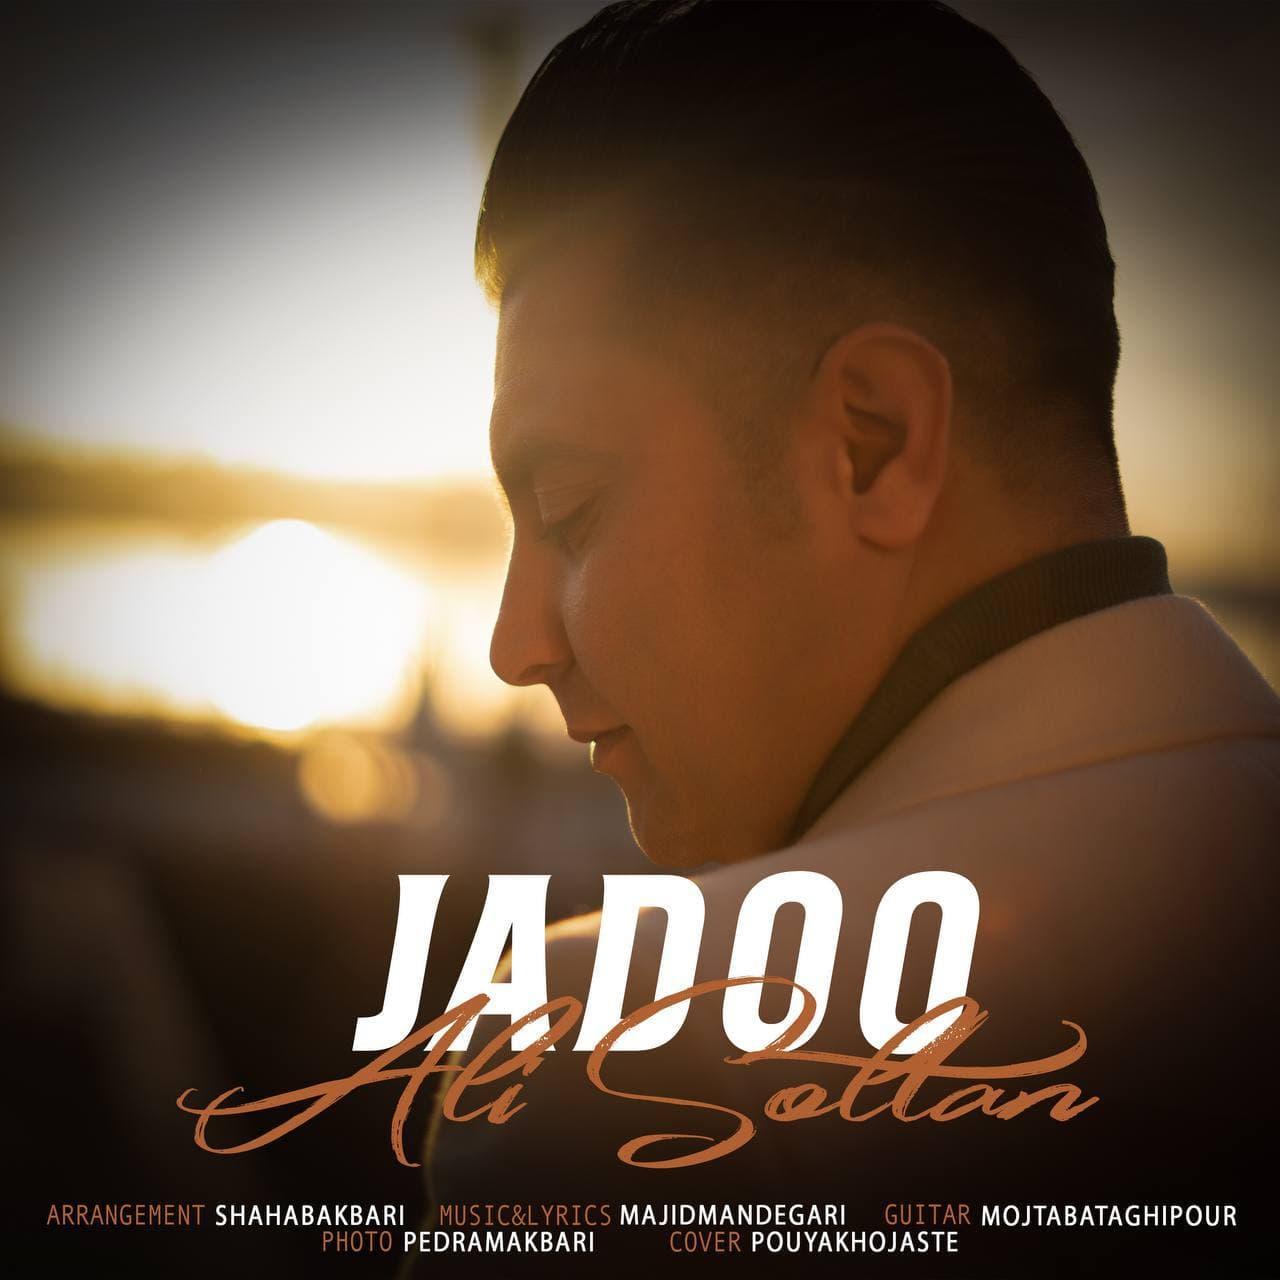 Ali Soltan – Jadoo